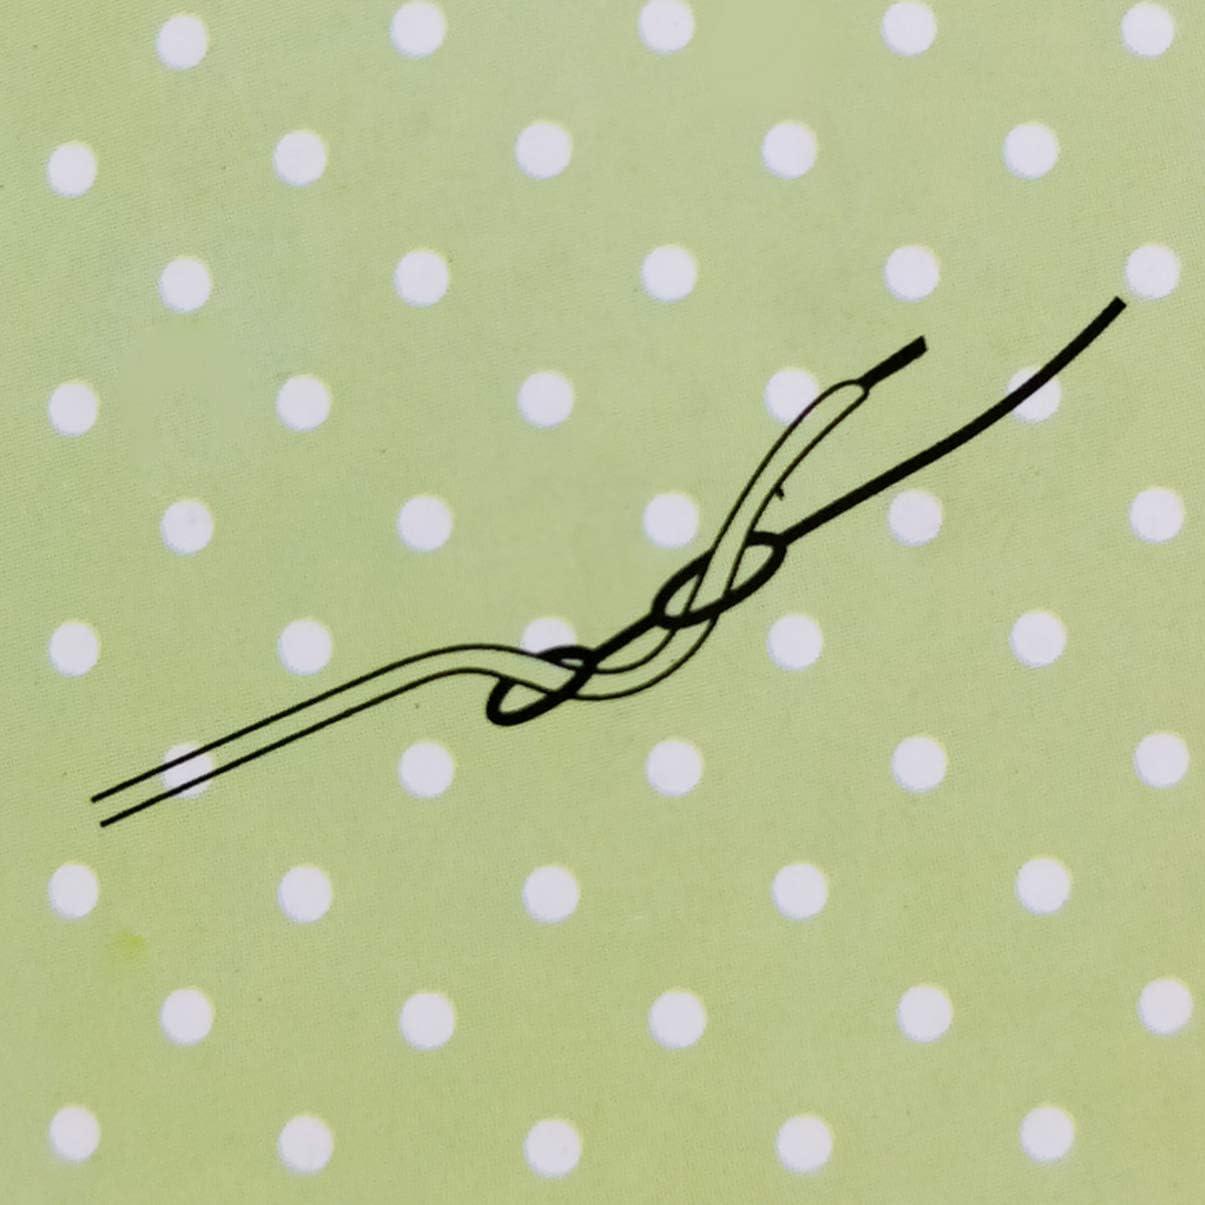 SUPVOX 2pcs Plastic Threader Drawstring Threader Long Elastic Band DIY Manual Tool for Pants Shoes Jackets Rosy